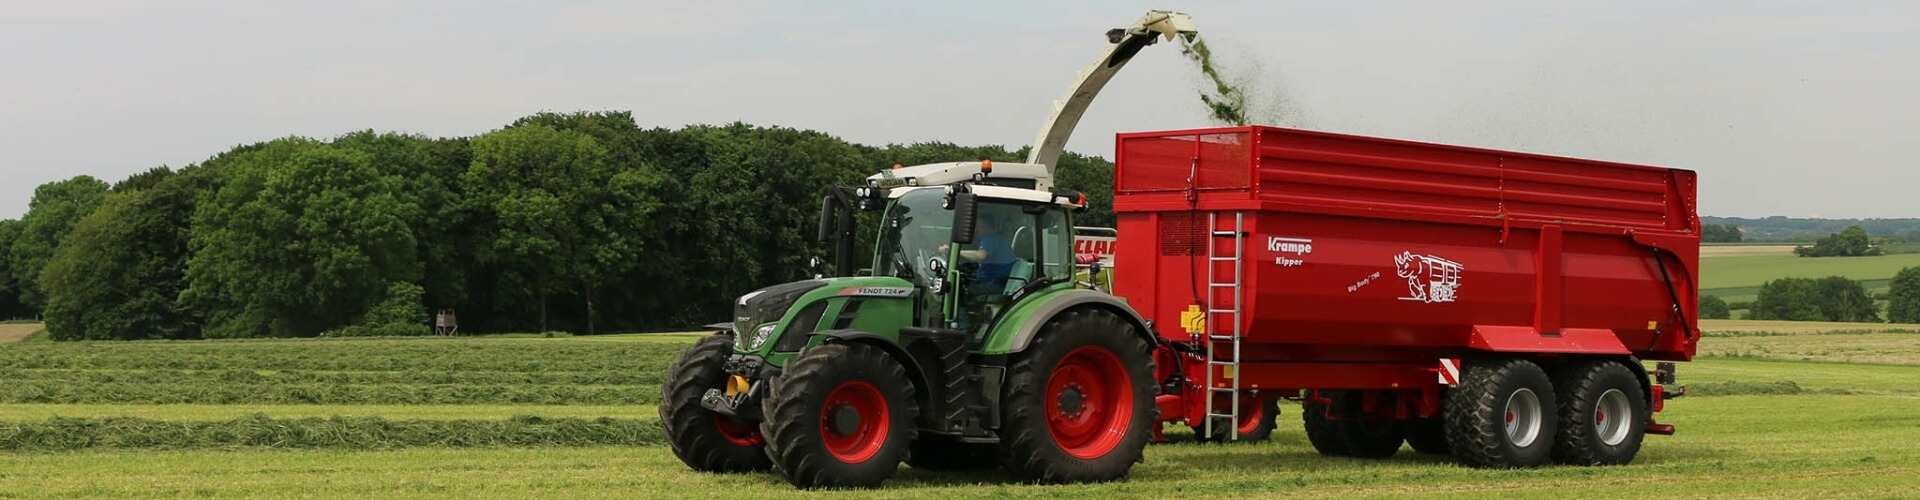 Krampe trailer Fendt tractor grass silage